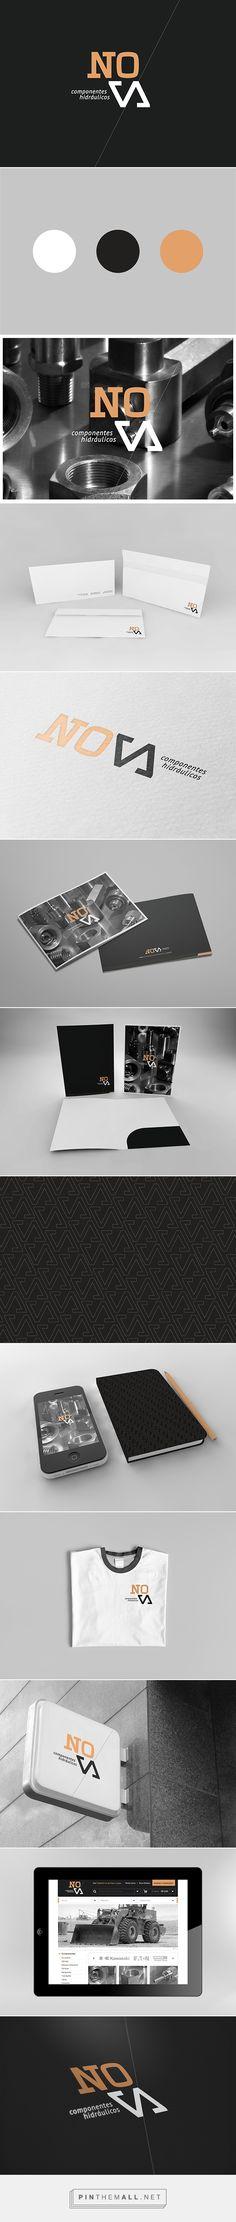 Nova Corporate Identity on Behance | Fivestar Branding – Design and Branding Agency & Inspiration Gallery